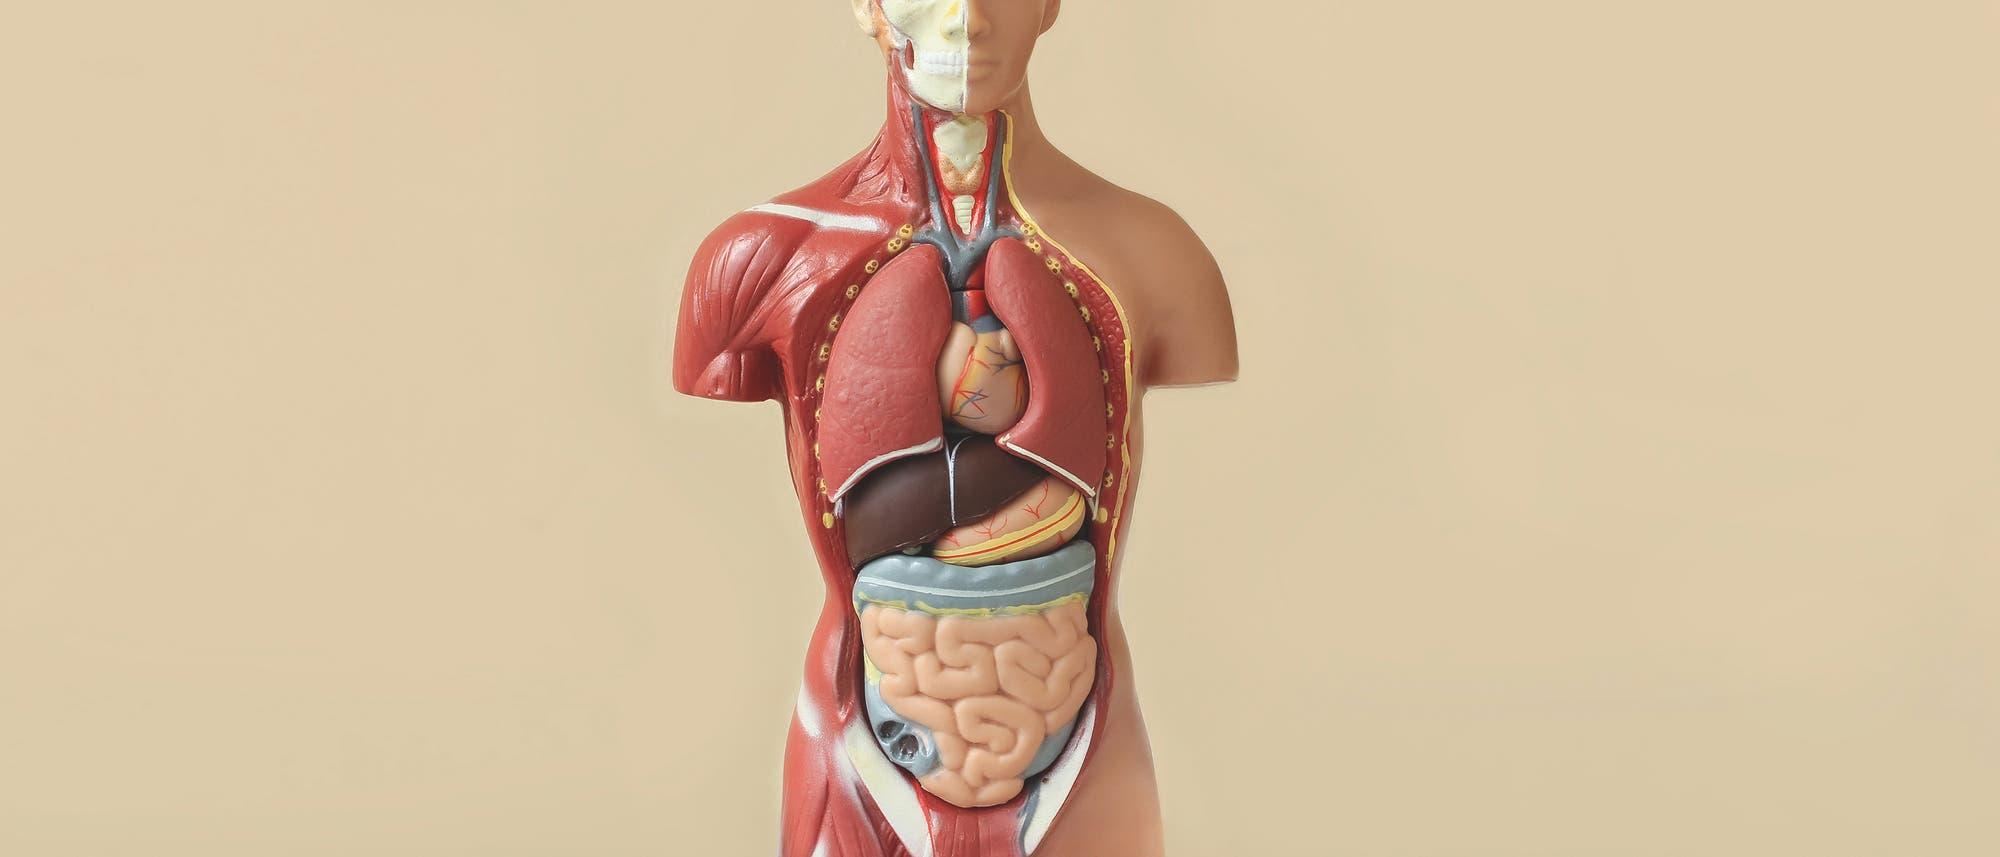 Anatomiemodell